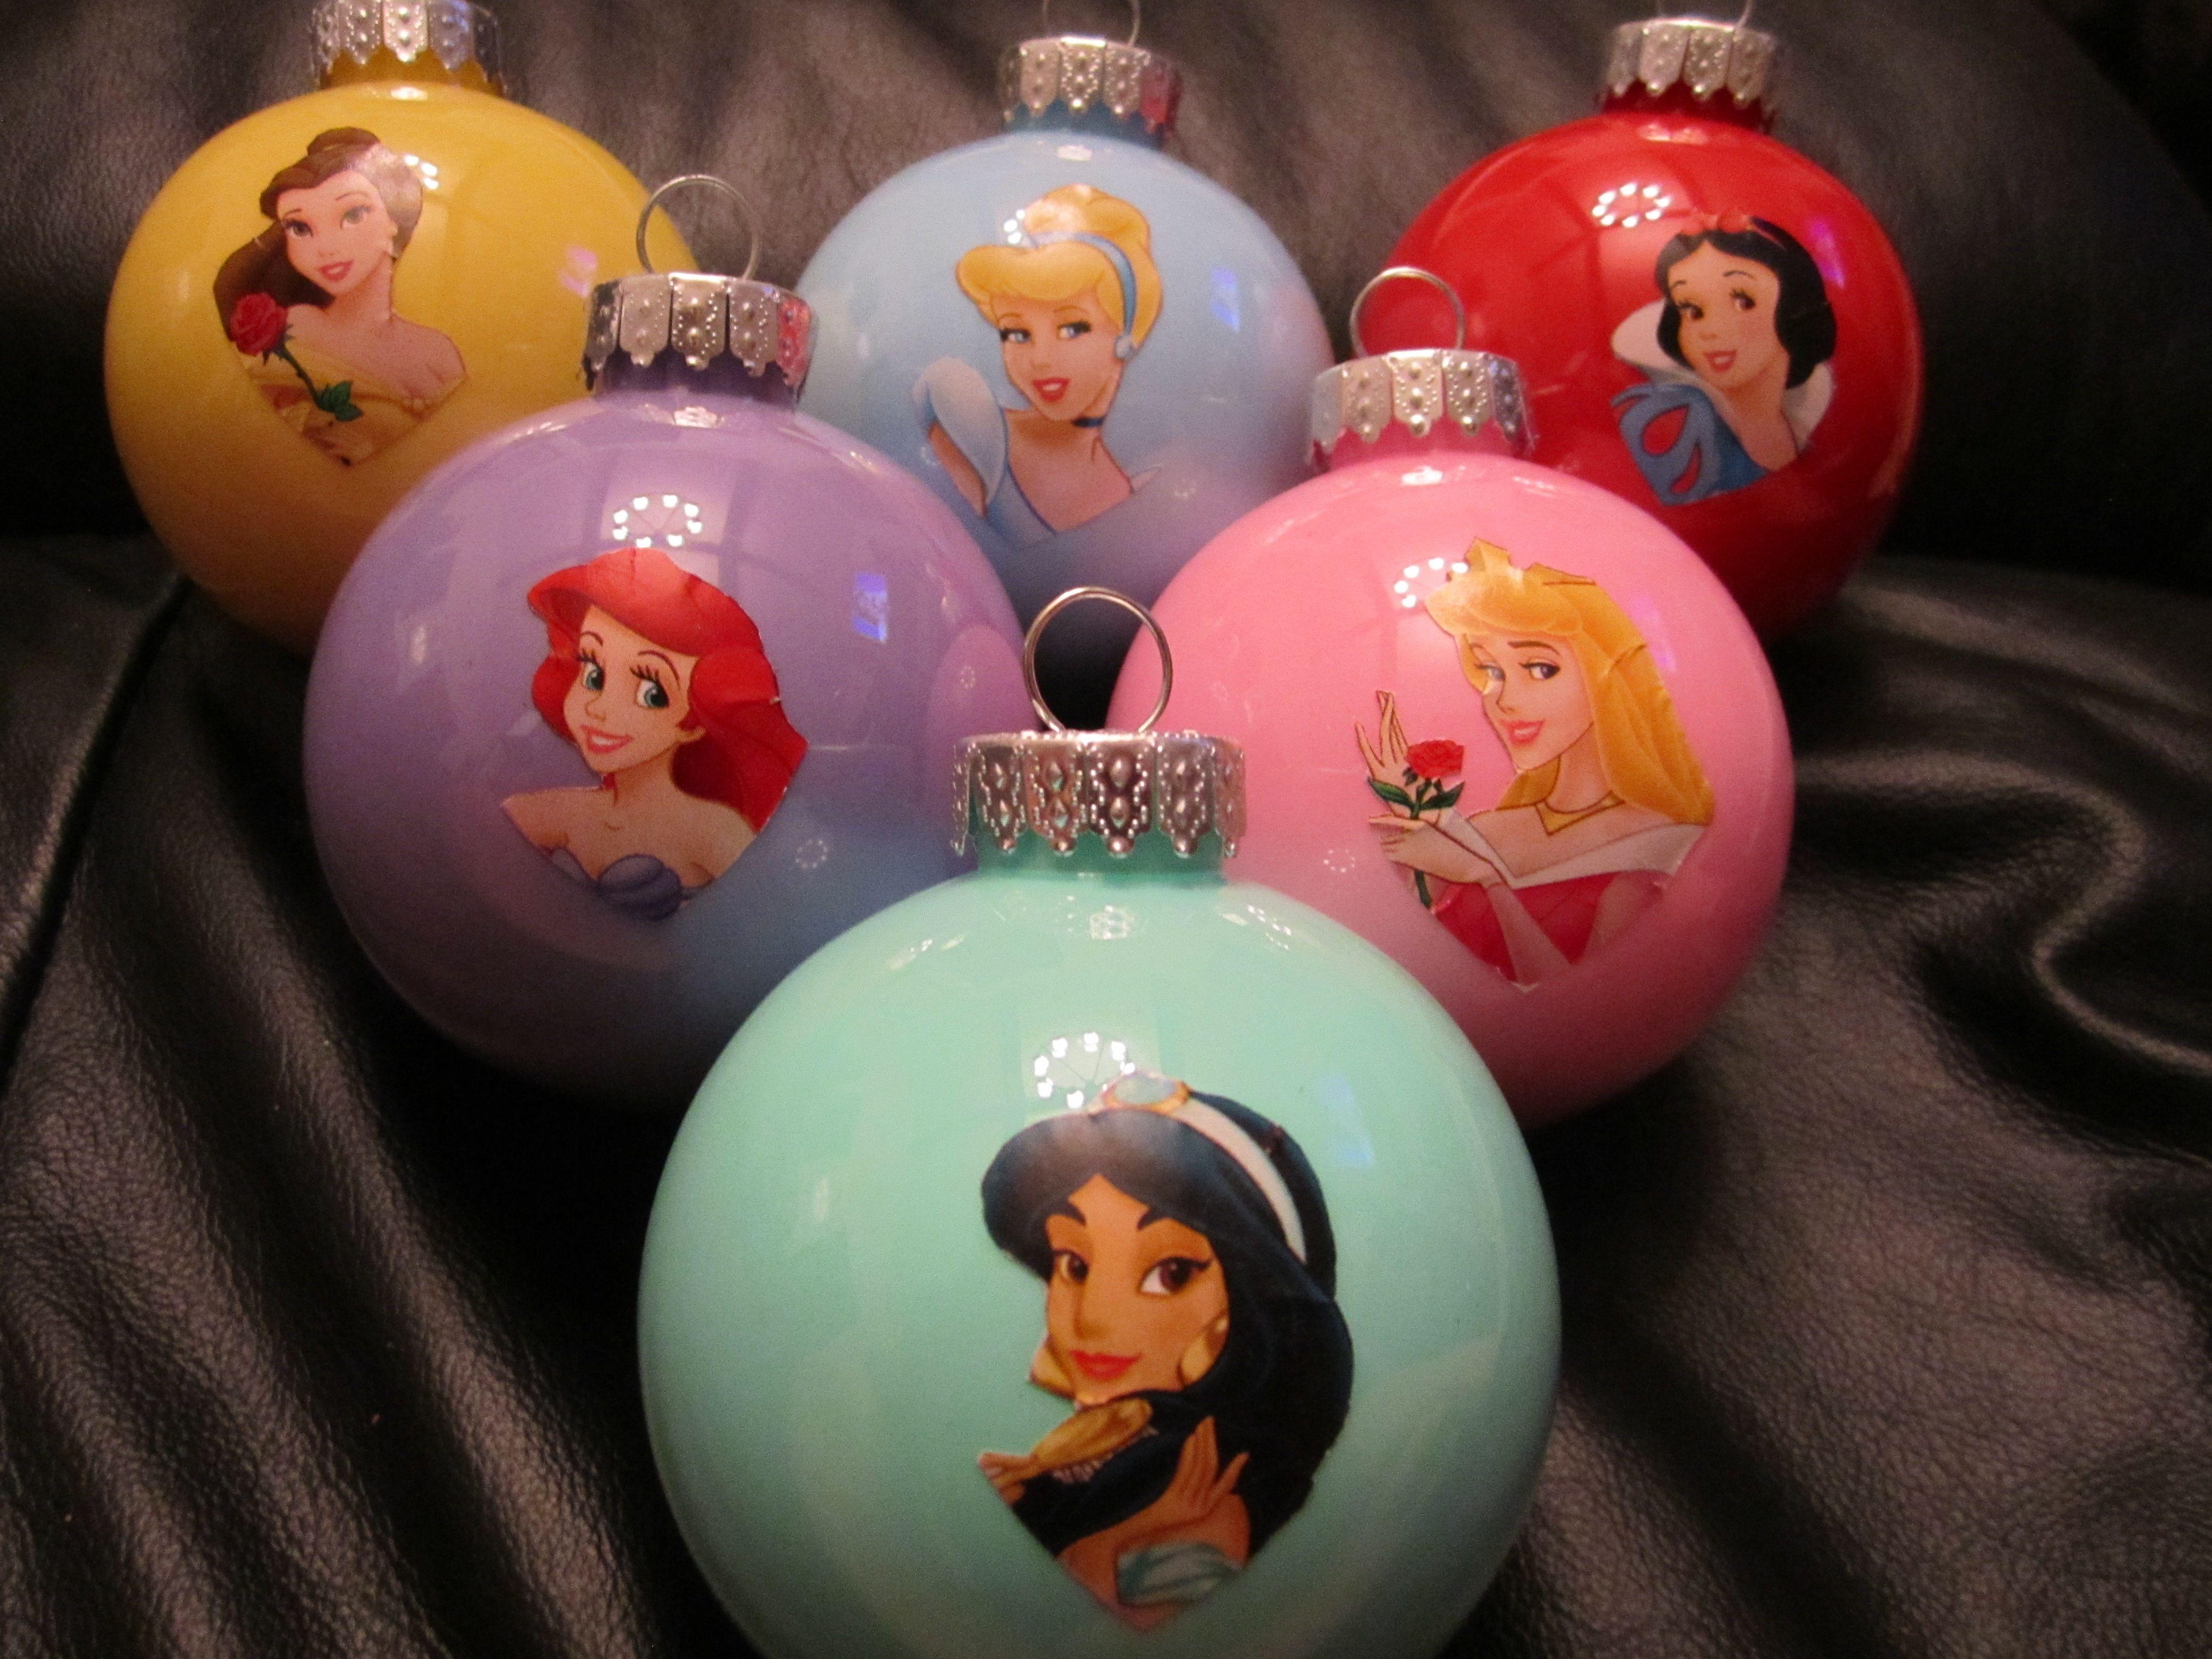 My Take On The Superhero Ornaments Disney Princesses )